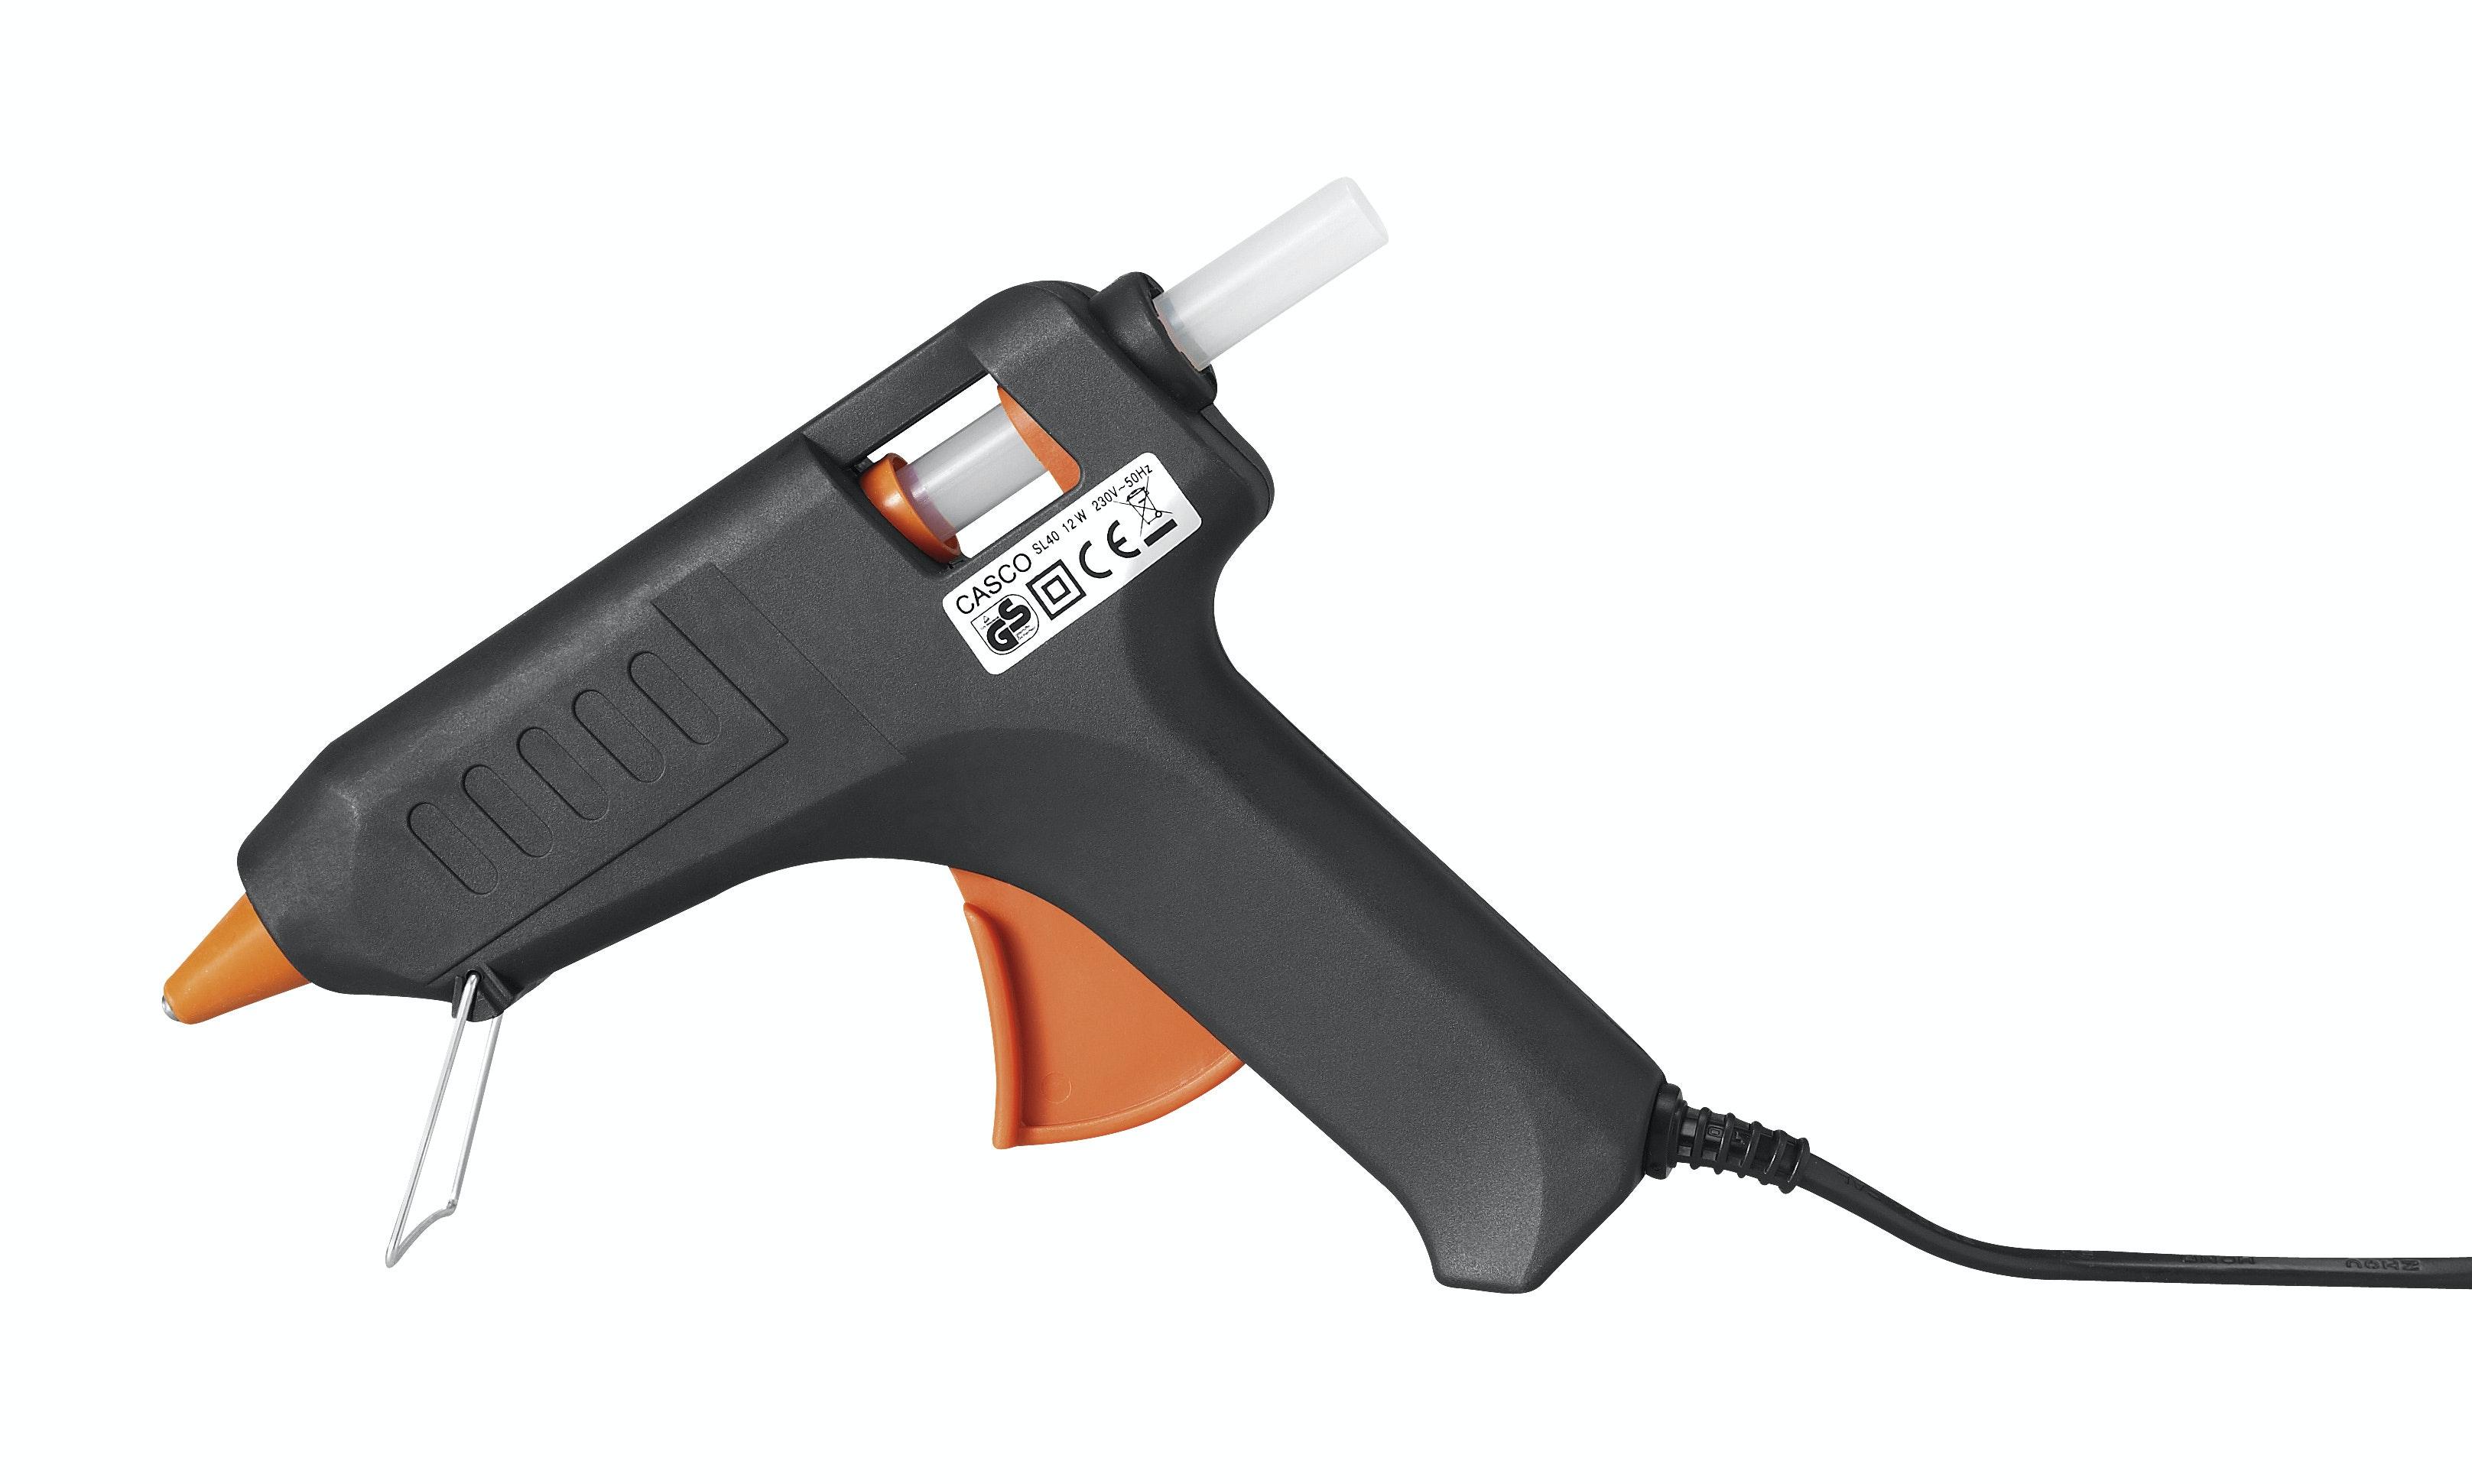 Limpistol Casco HotMelt SL40 12mm